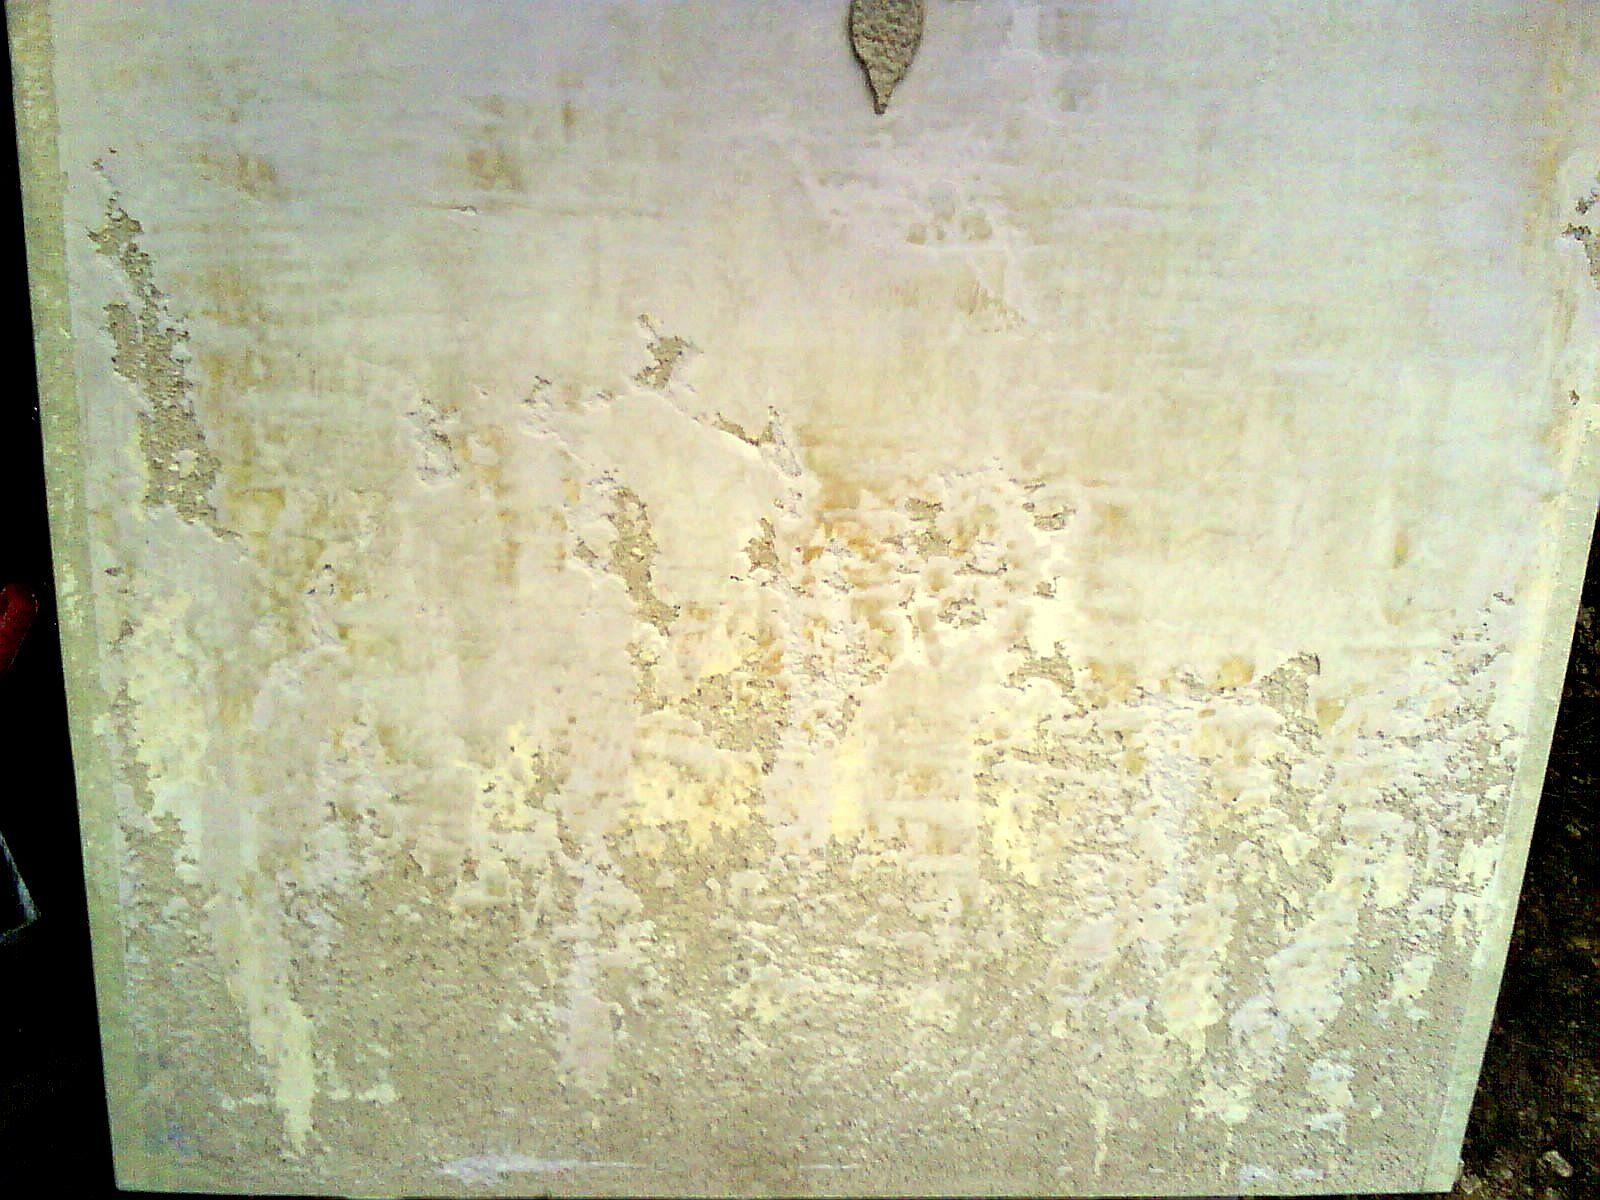 Venetian plaster faux finish | Faux Finishes | Pinterest | Venetian ...